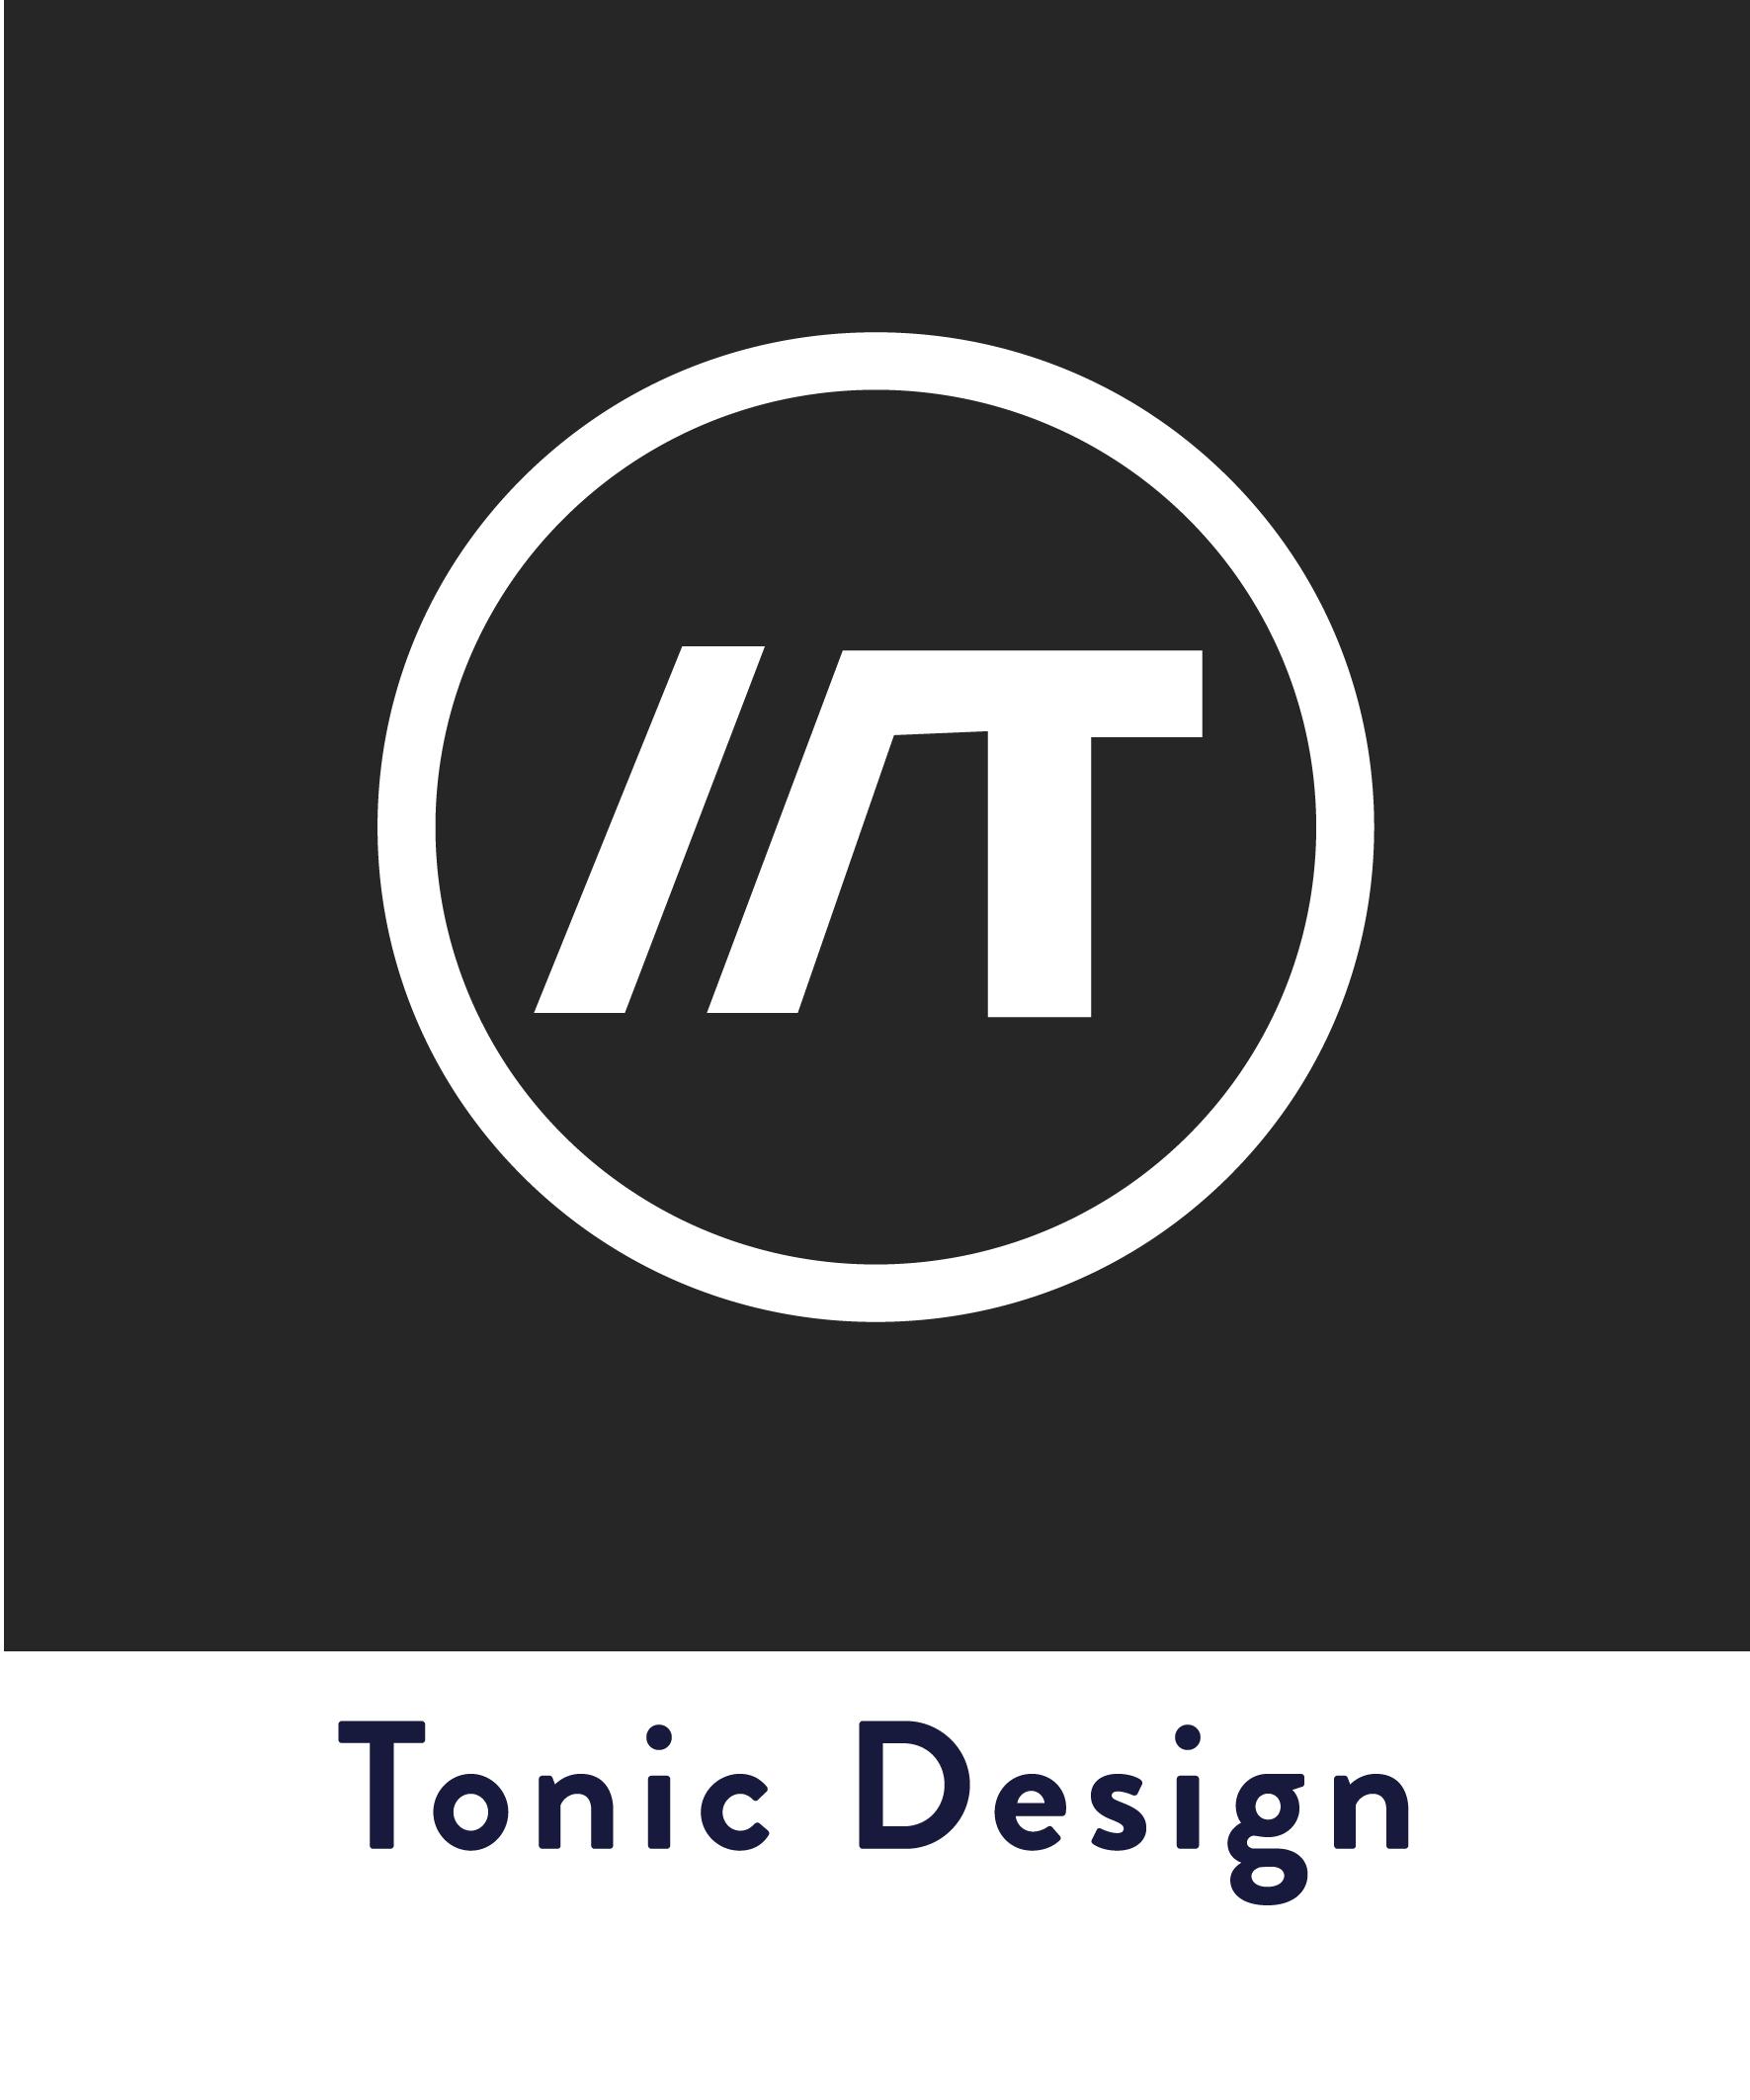 Tonic Design.png